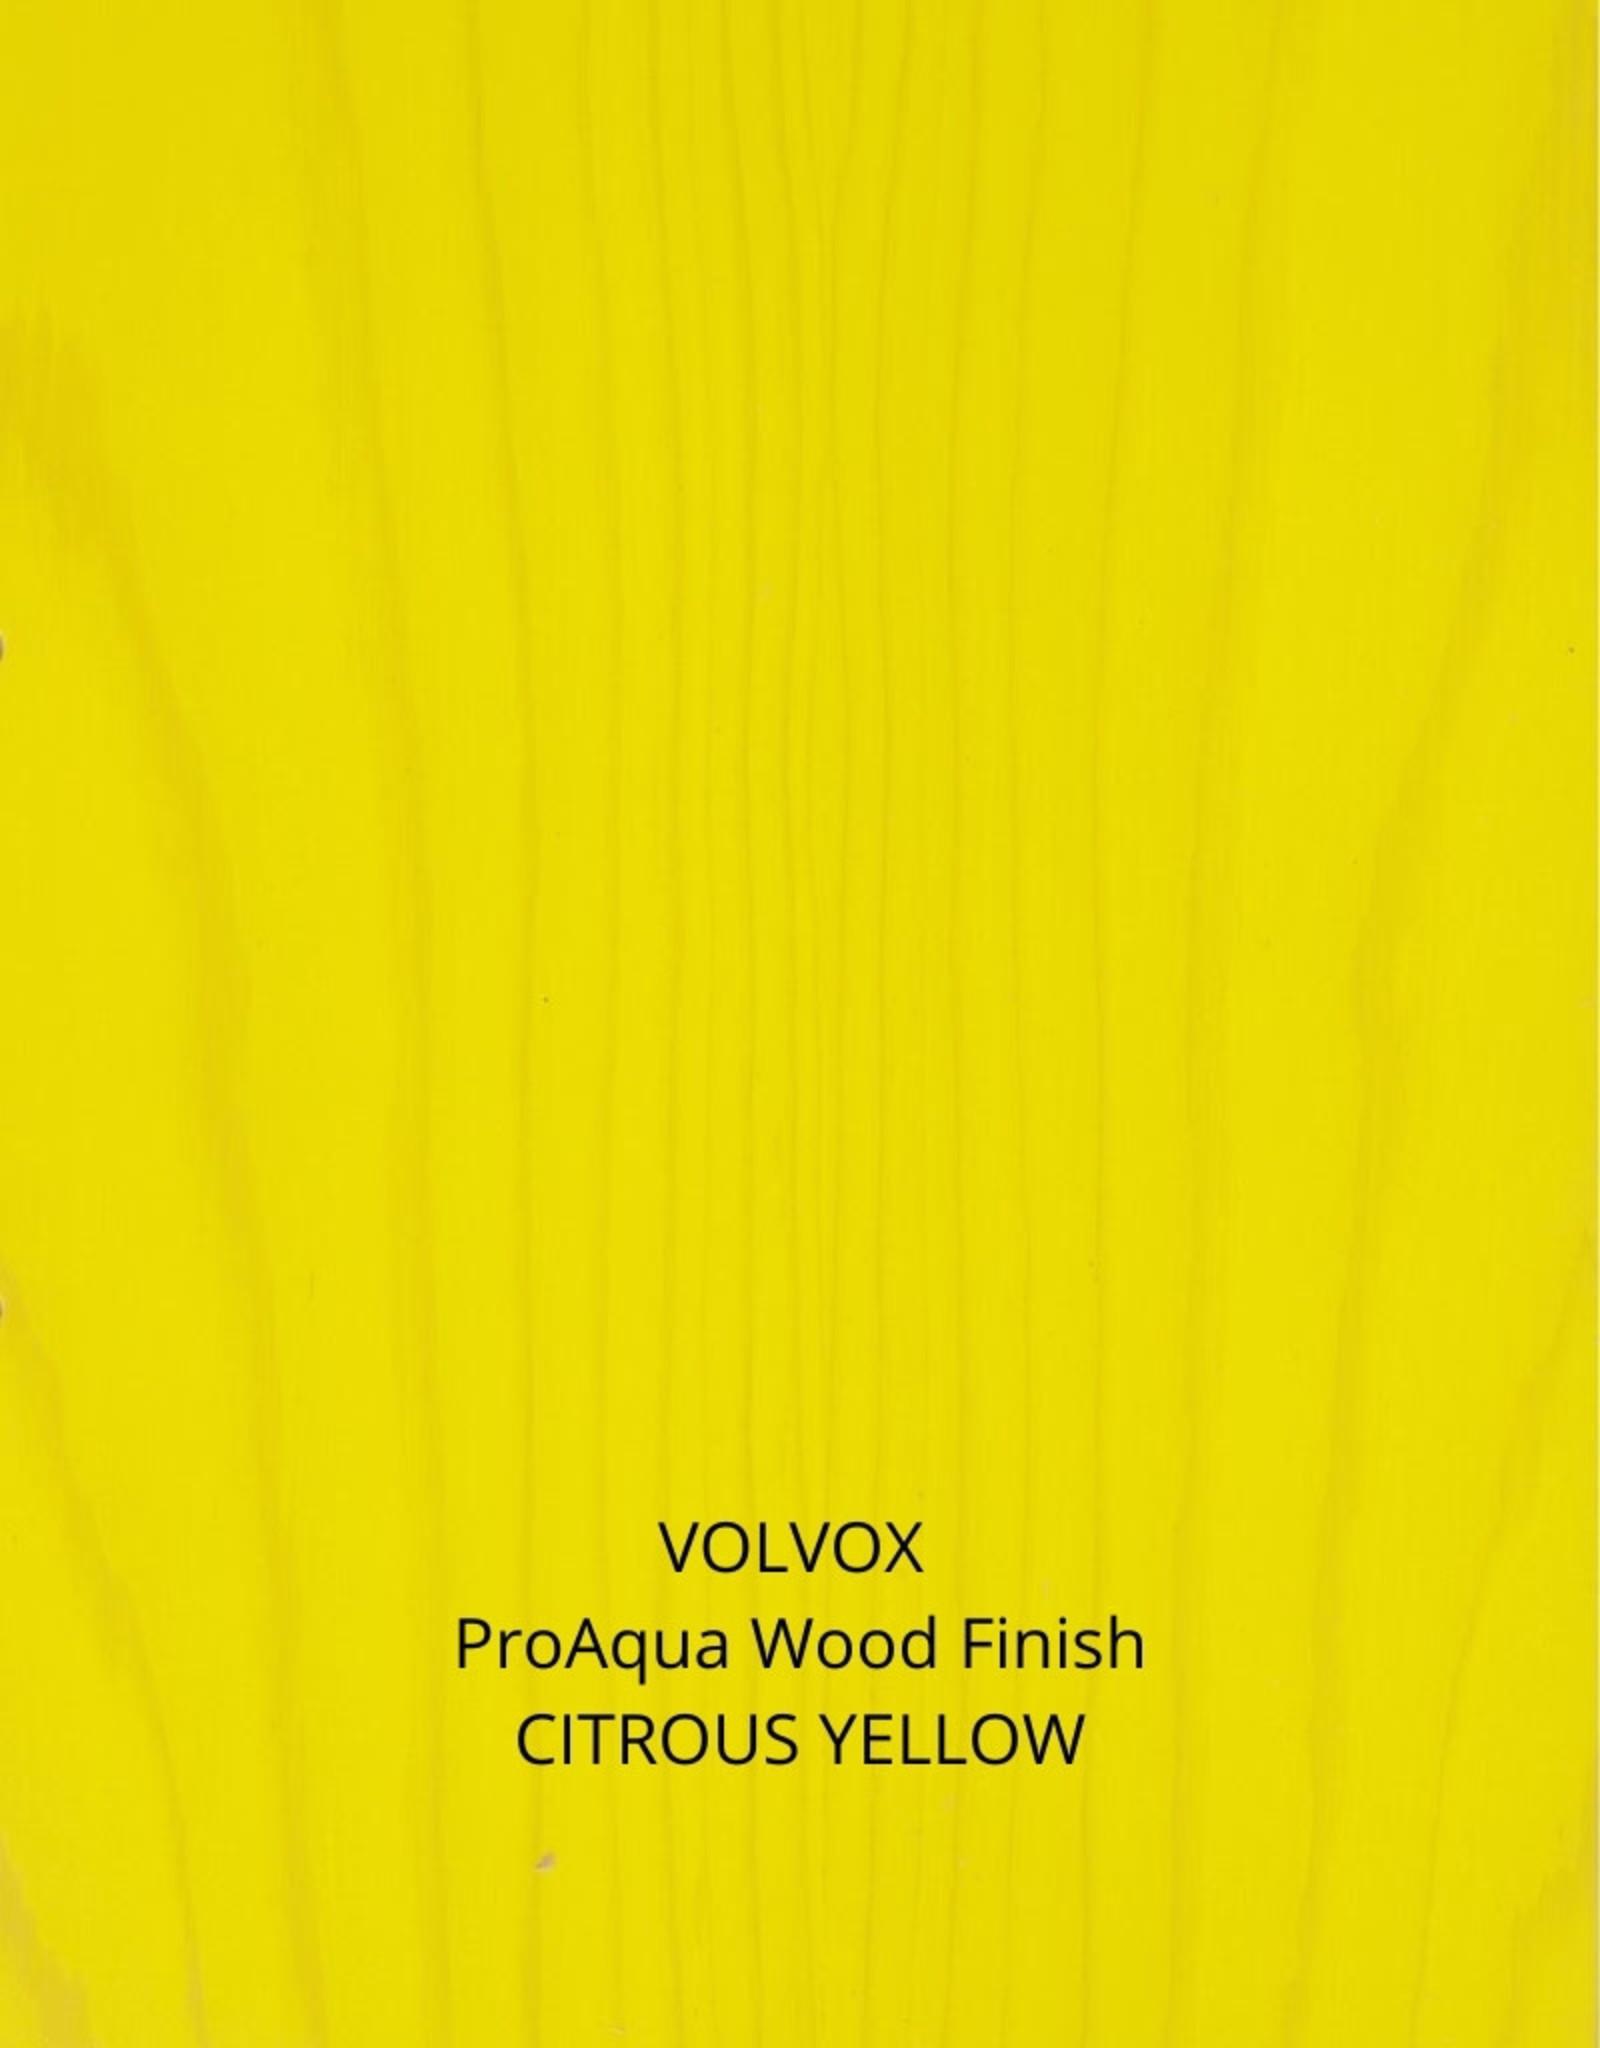 VOLVOX ProAqua Wood Finish